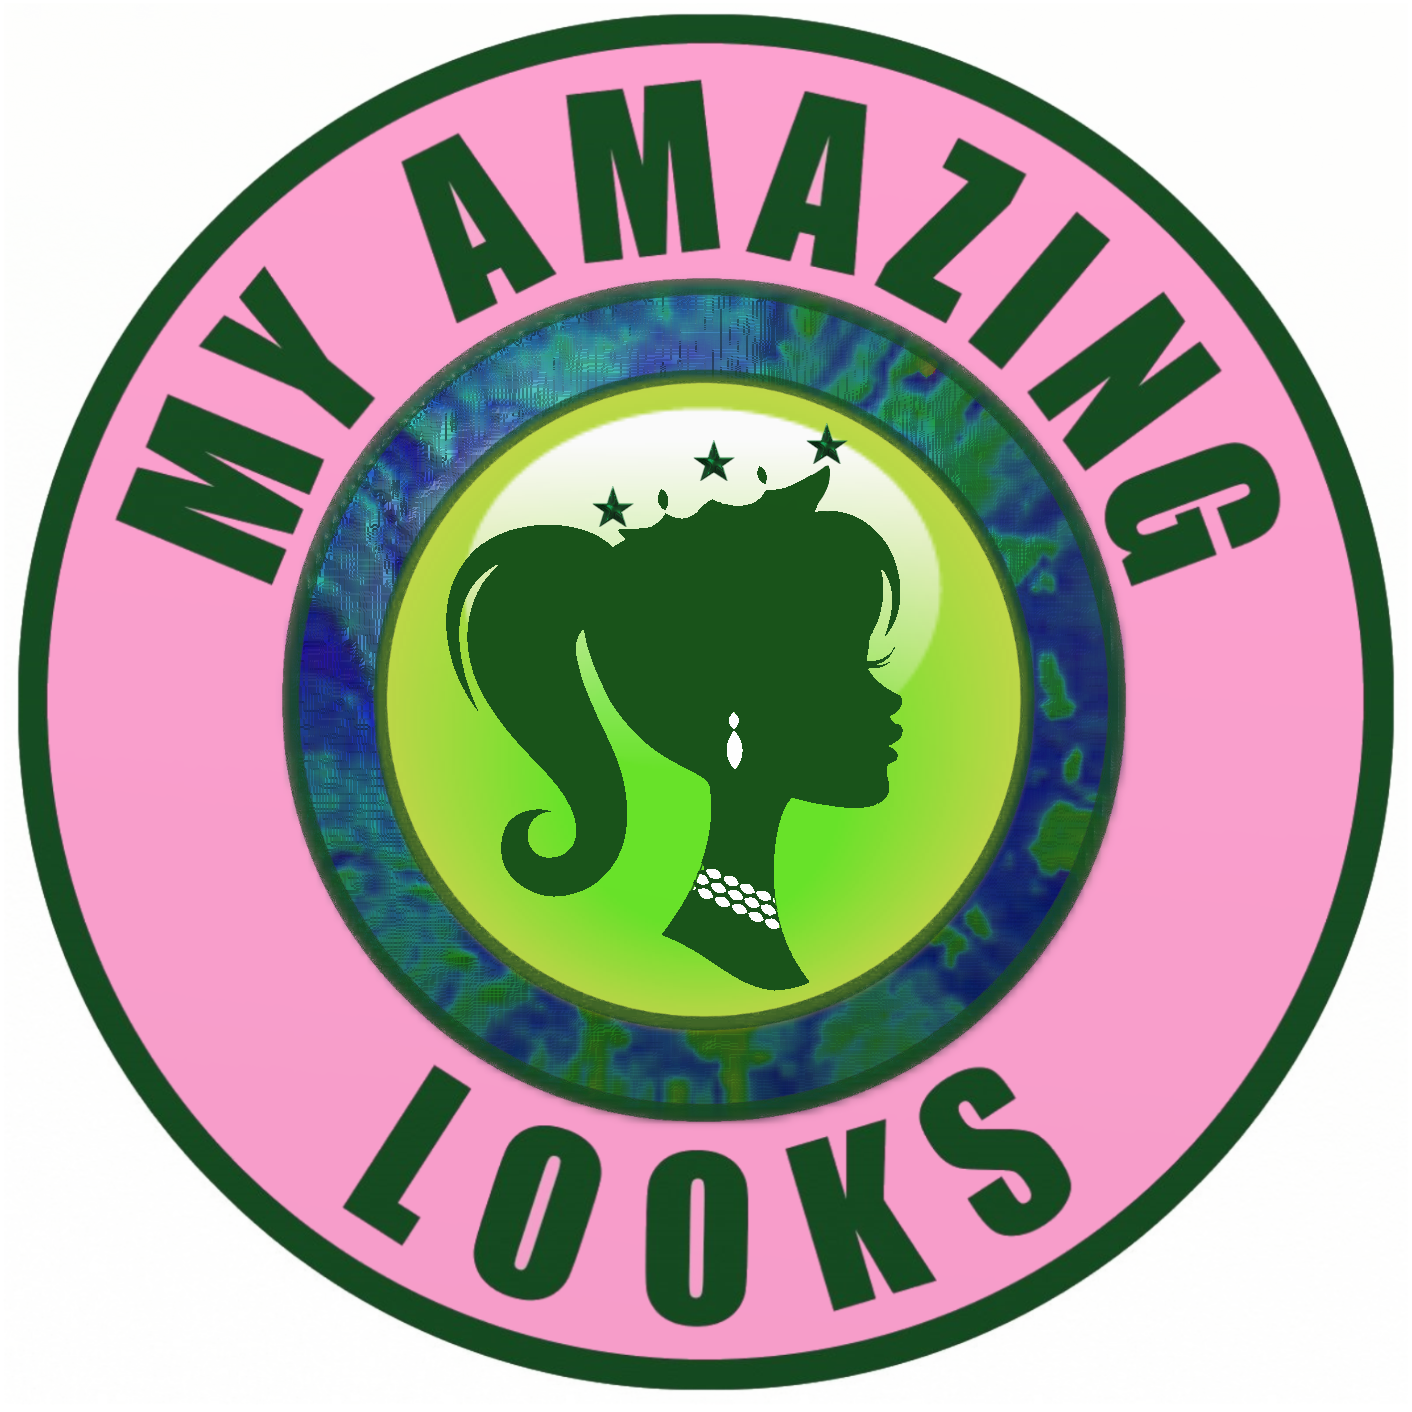 My Amazing Looks - Skin Care & Best Mink Lashes